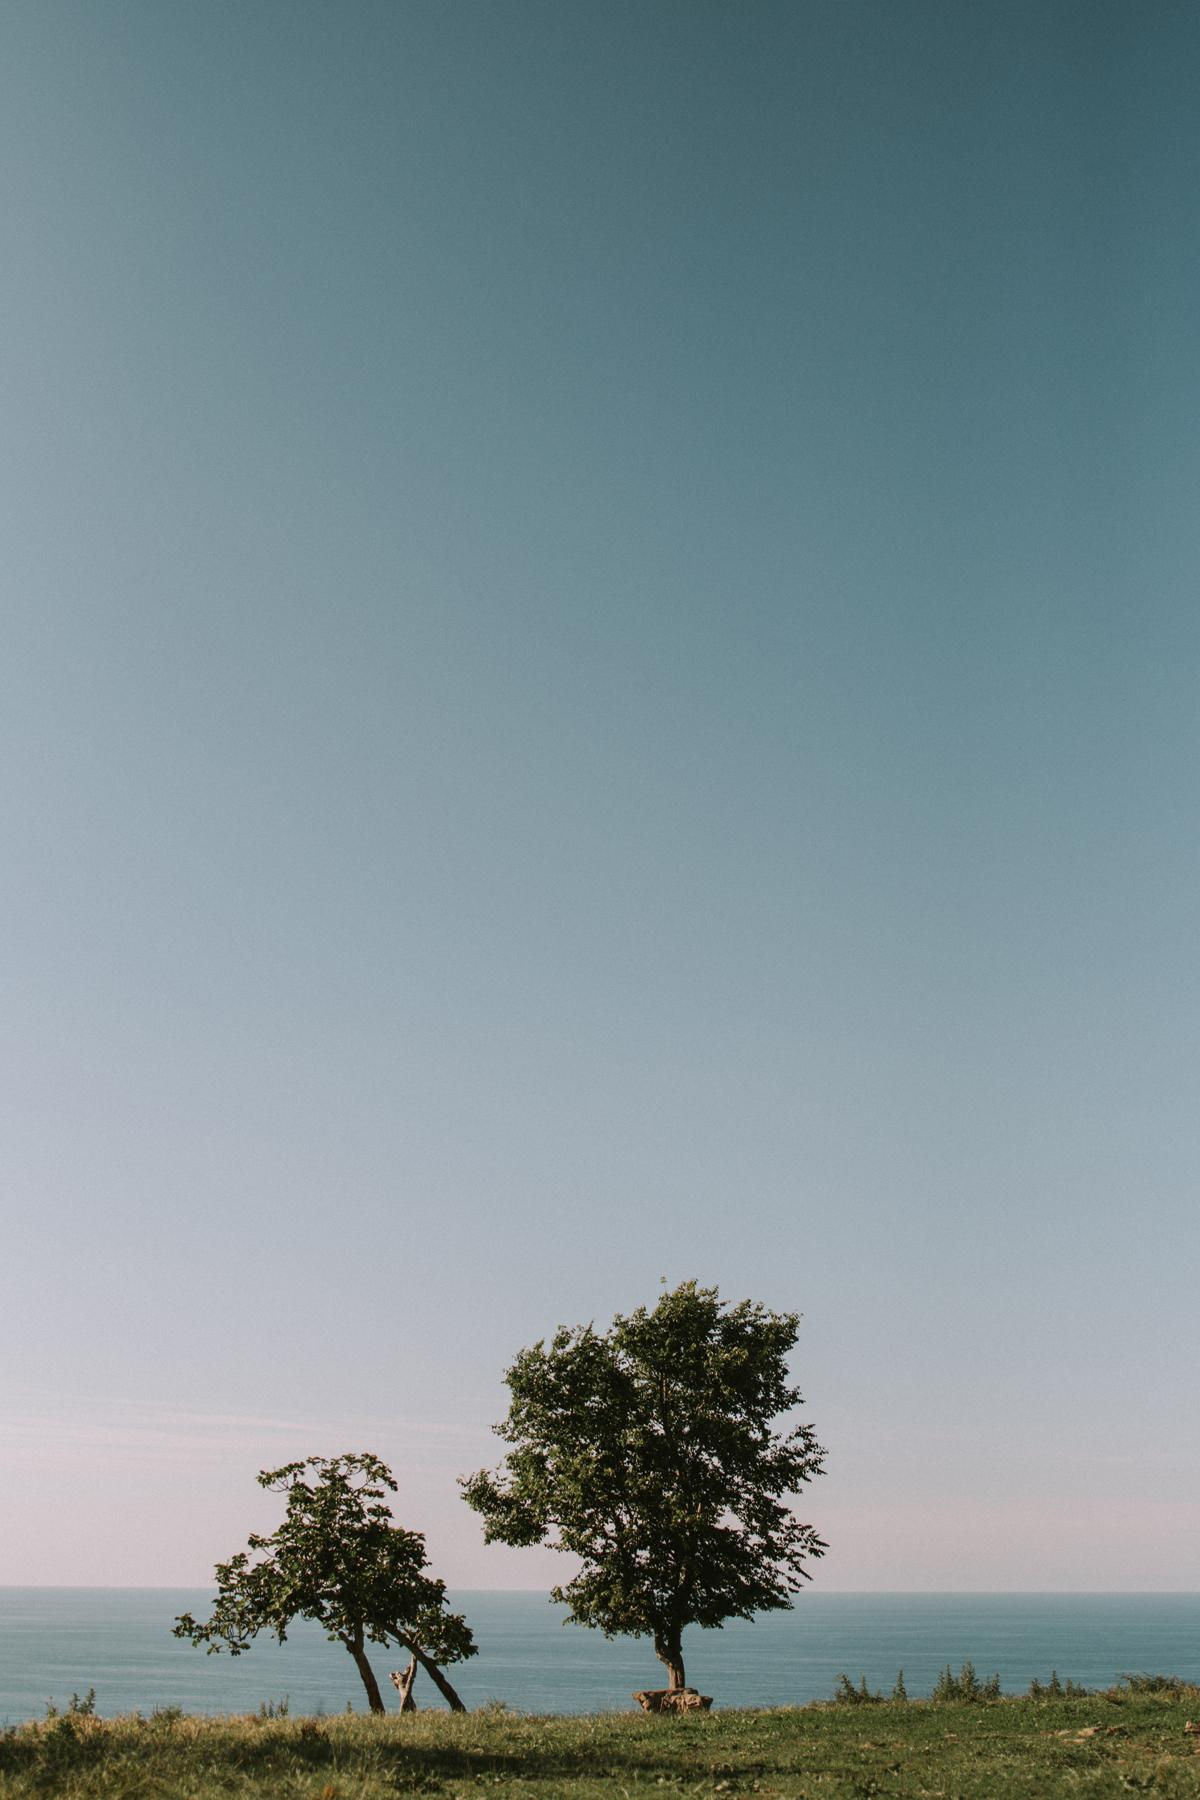 035-Liene-Petersone-Photography-